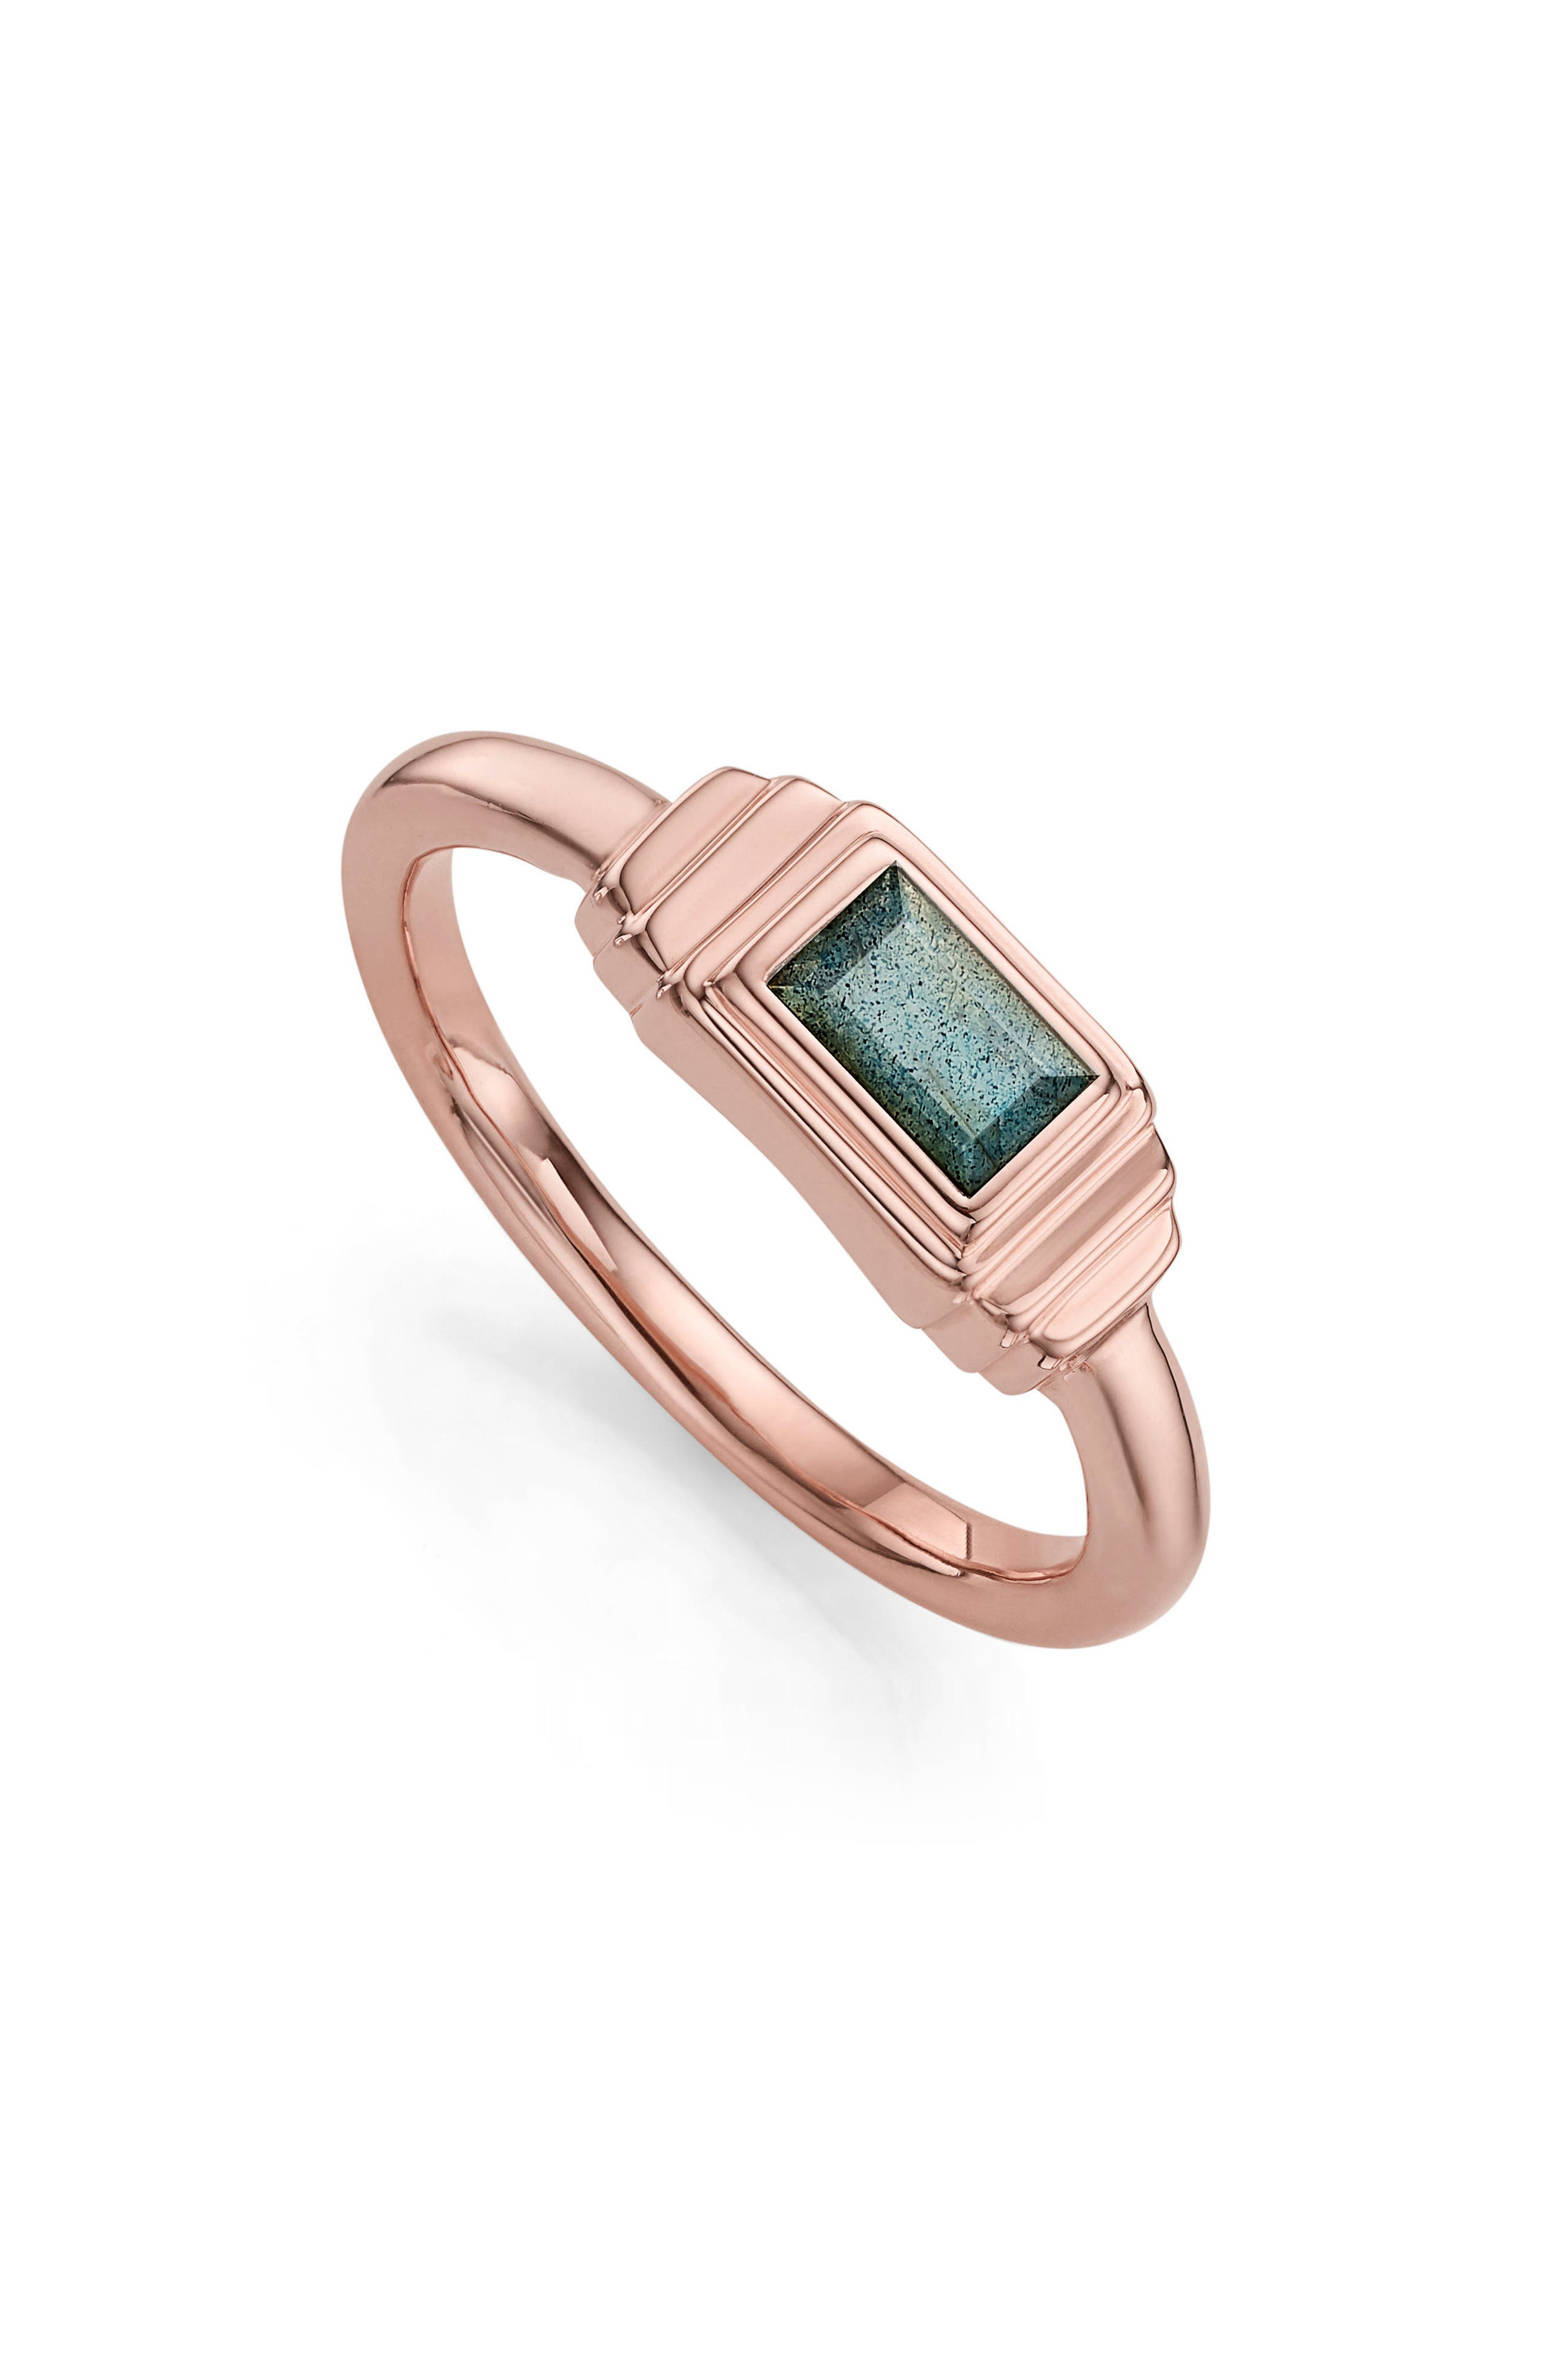 Main Image - Monica Vinader Baja Deco Semiprecious Stone Ring